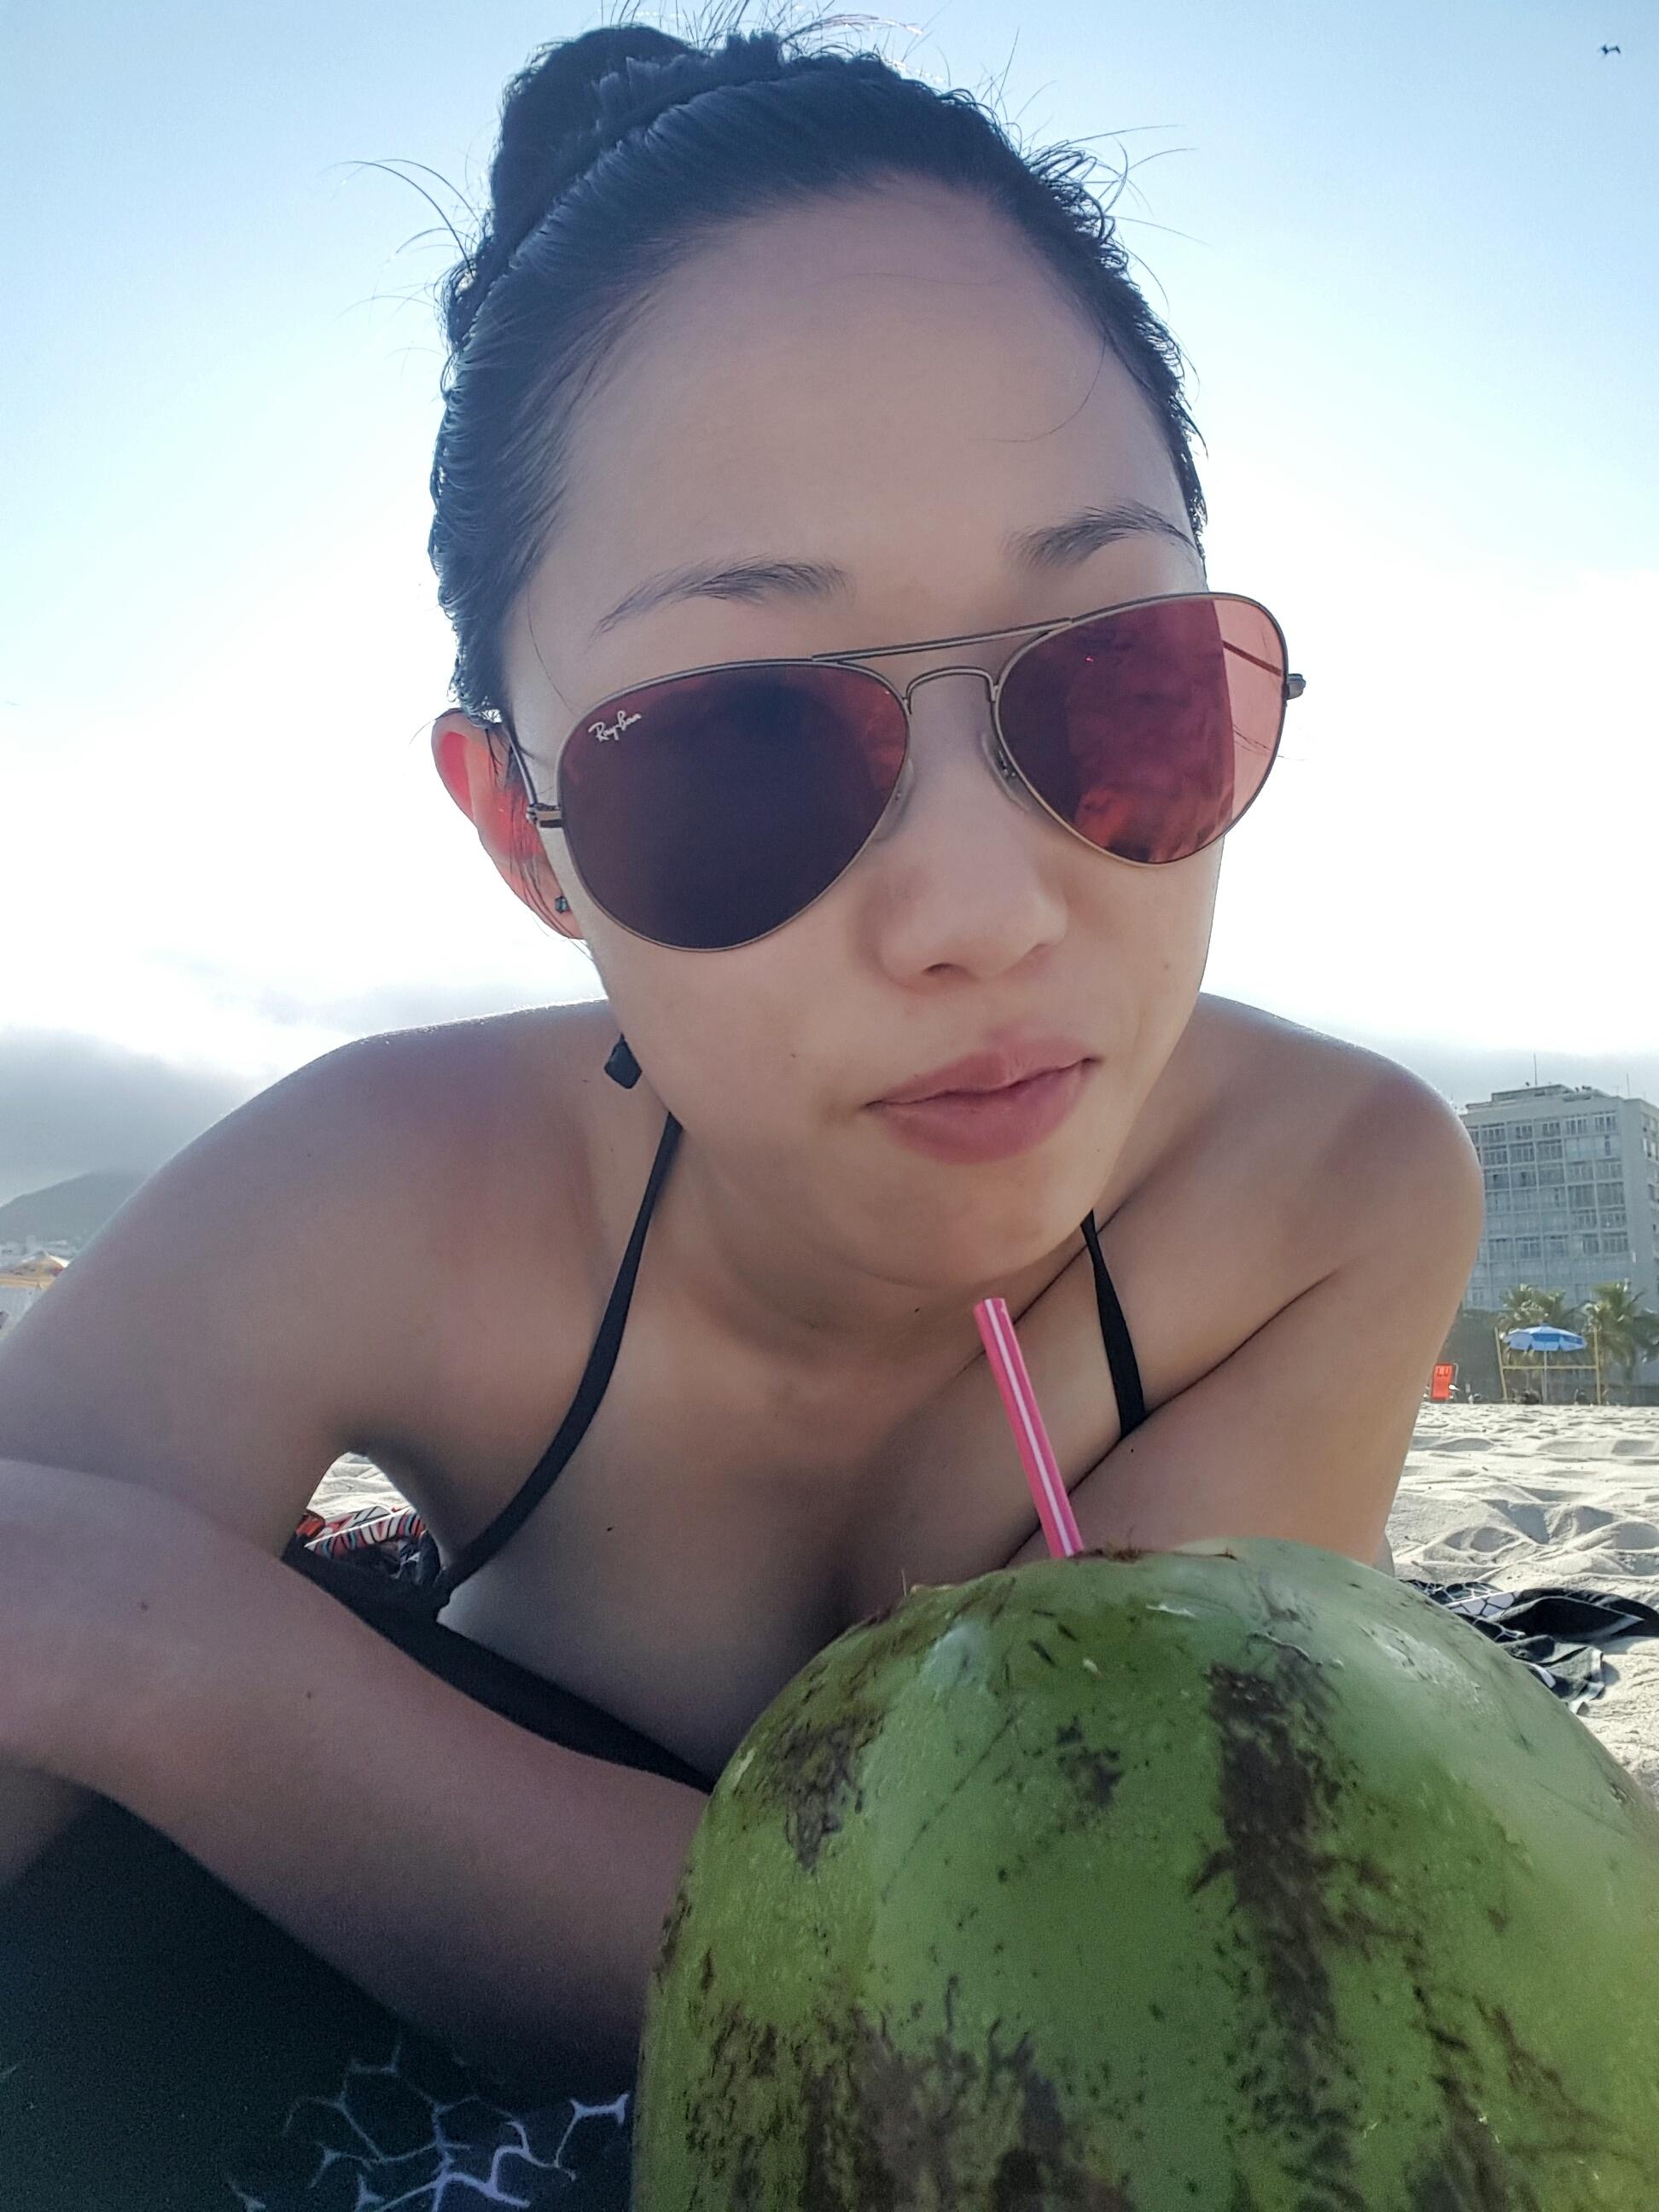 Cocounut on Copacabana Beach